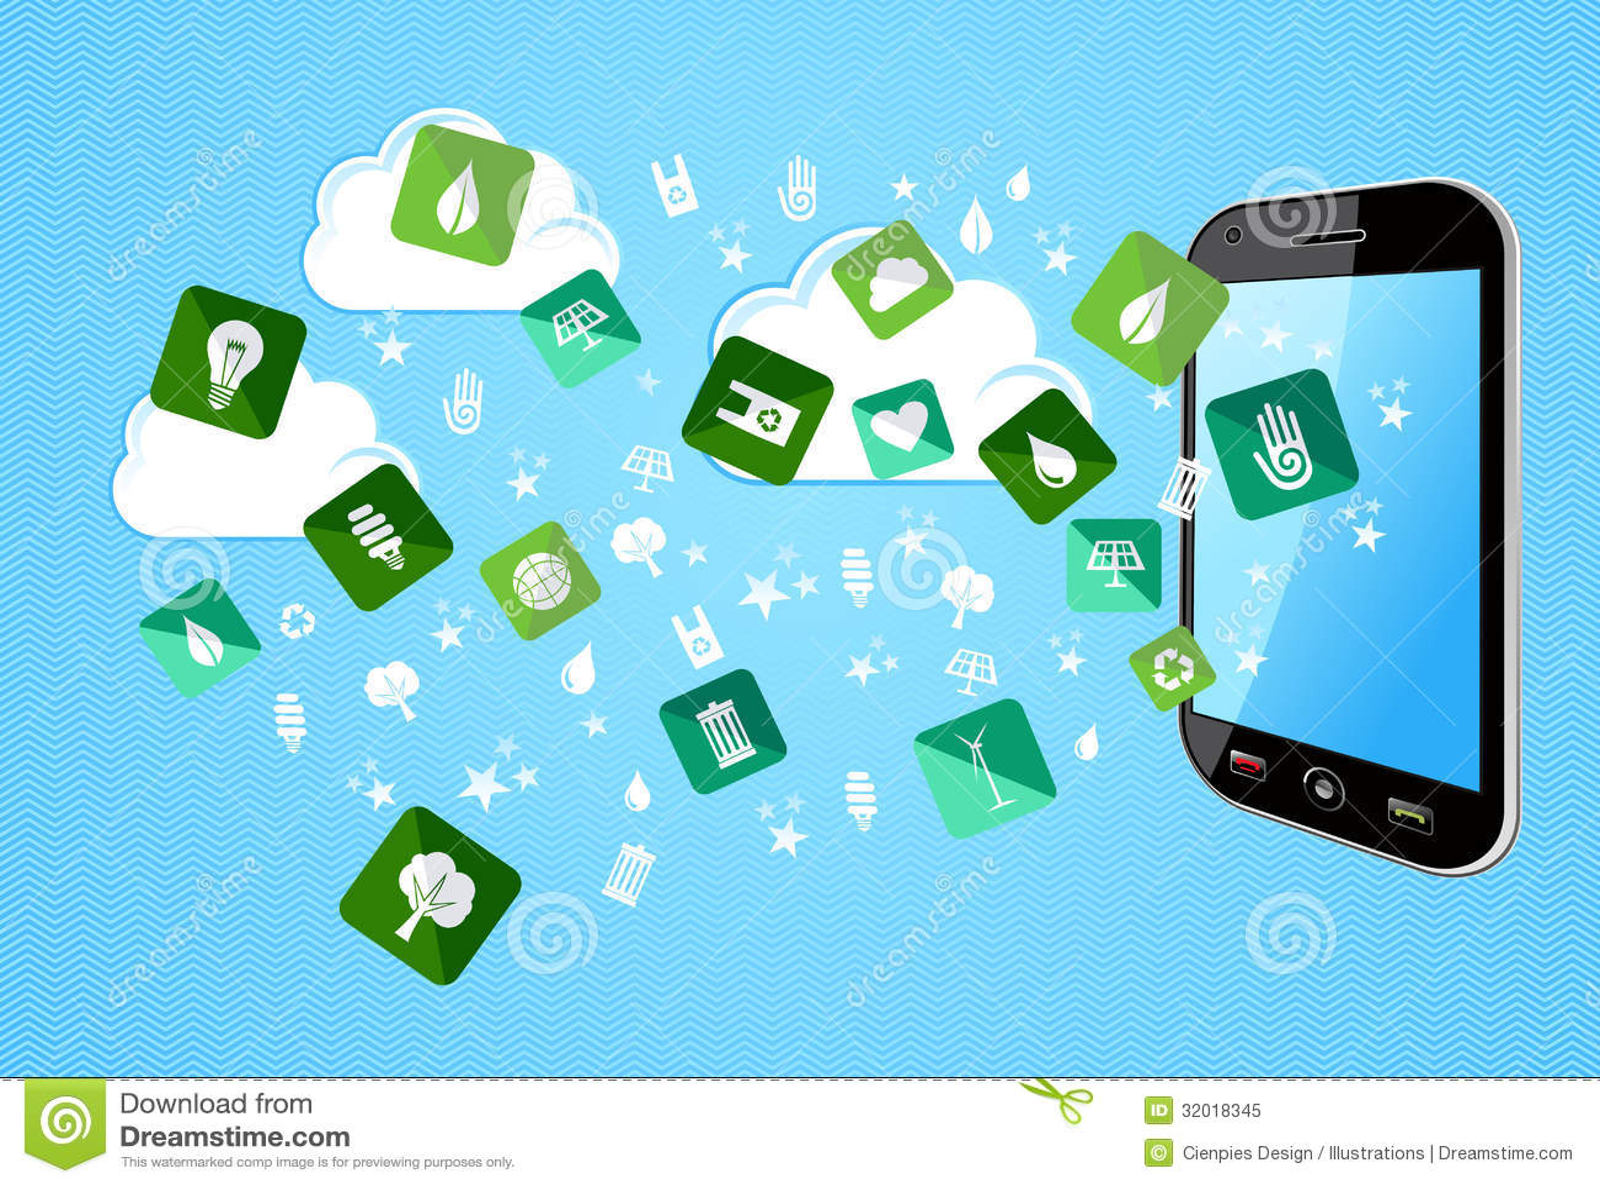 Скачать Eco Technology Flat Icons: Smart Phone Eco Friendly Icons Royalty Free Stock Photo